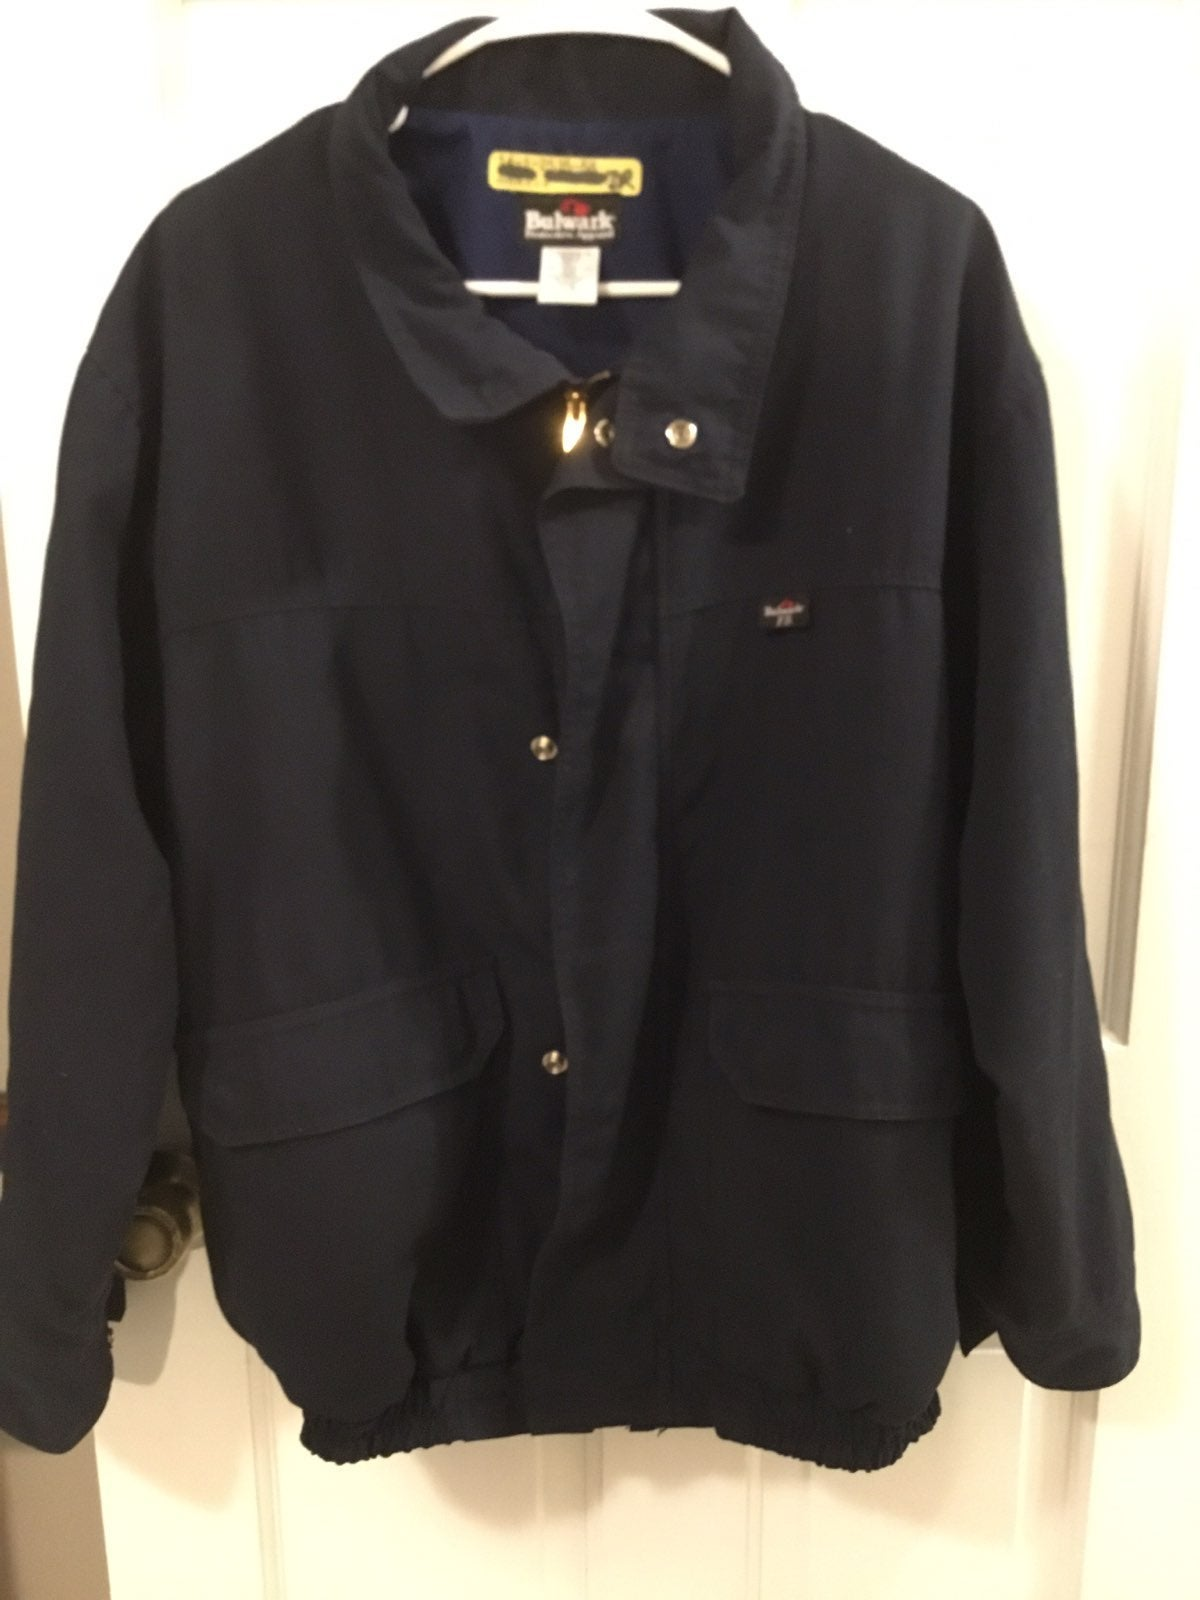 Bulwark Protective Apparel FR jacket